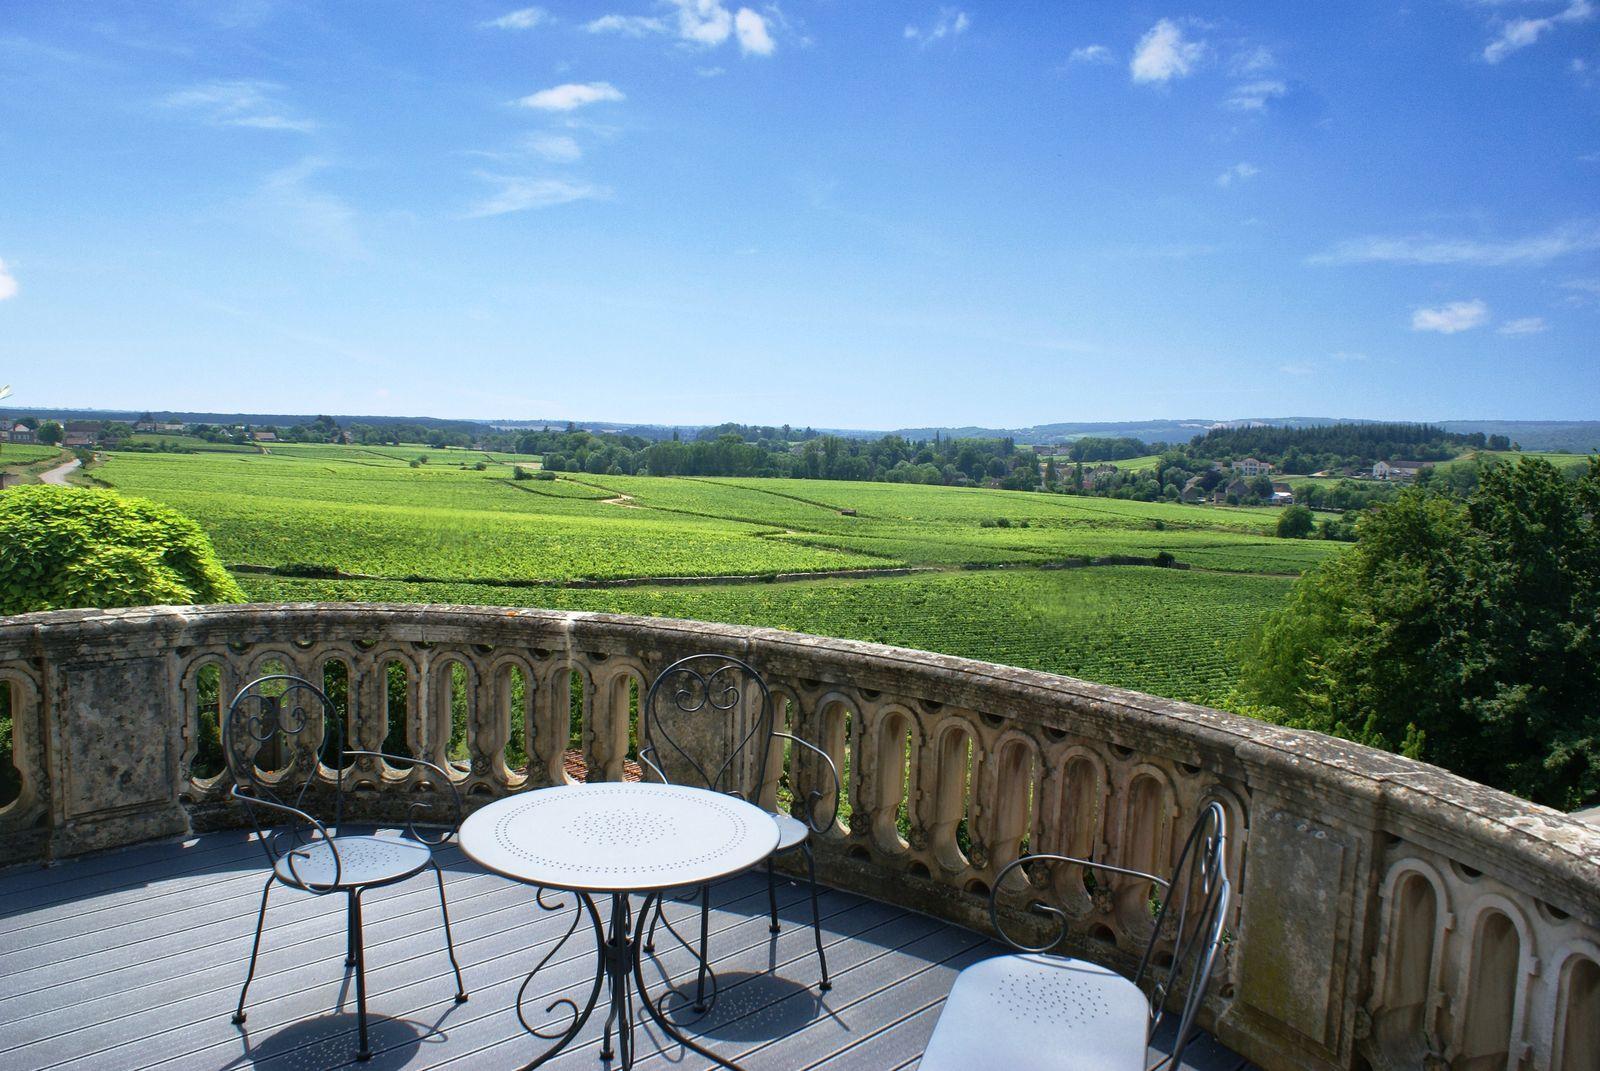 Le Chateau Bourgogne